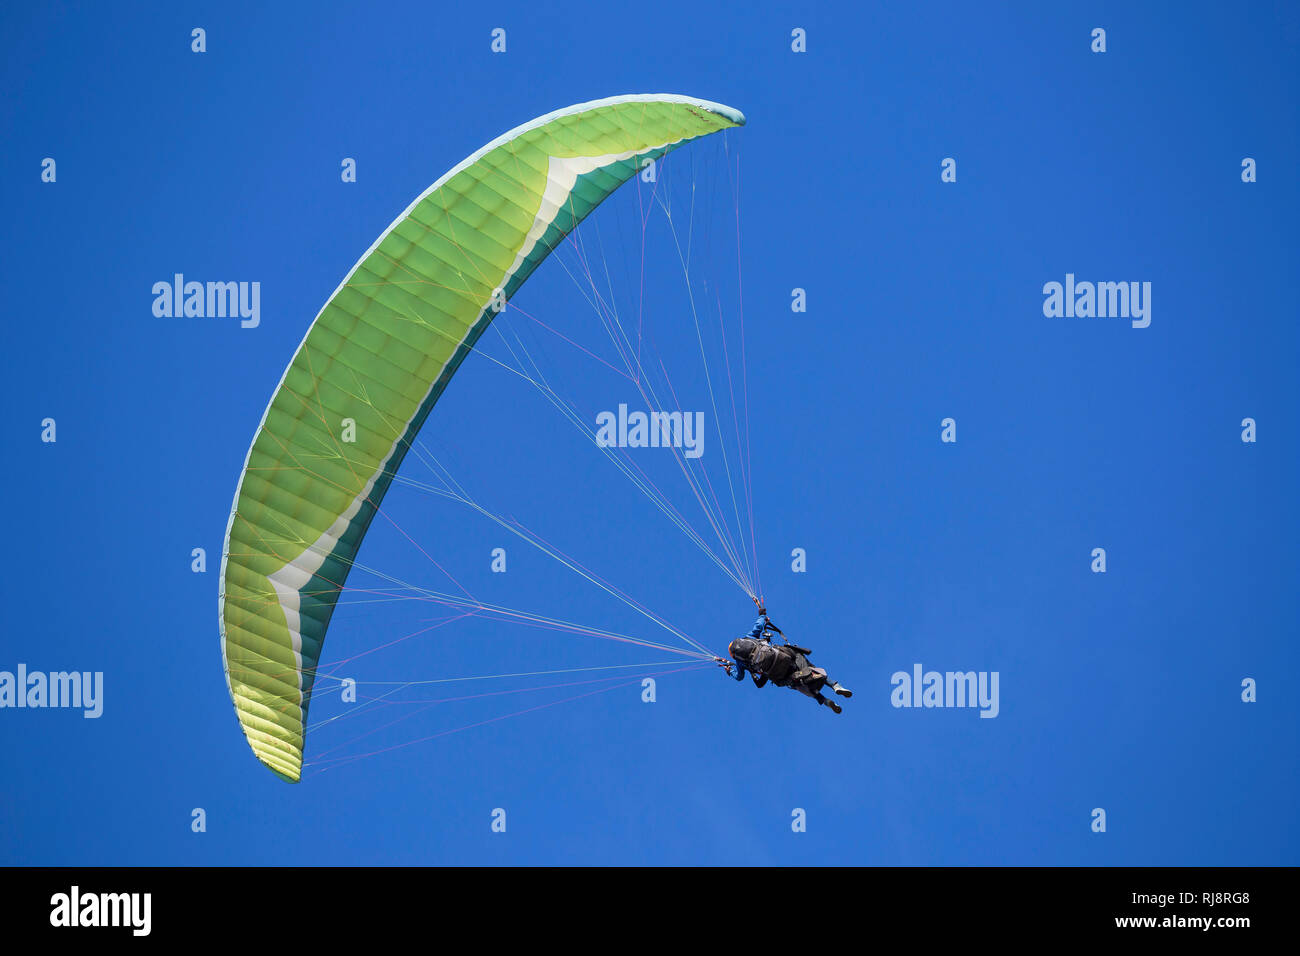 Gleitschirmflieger, Tandemflug, Puerto Naos, La Palma, Kanarische Inseln, Spanien - Stock Image